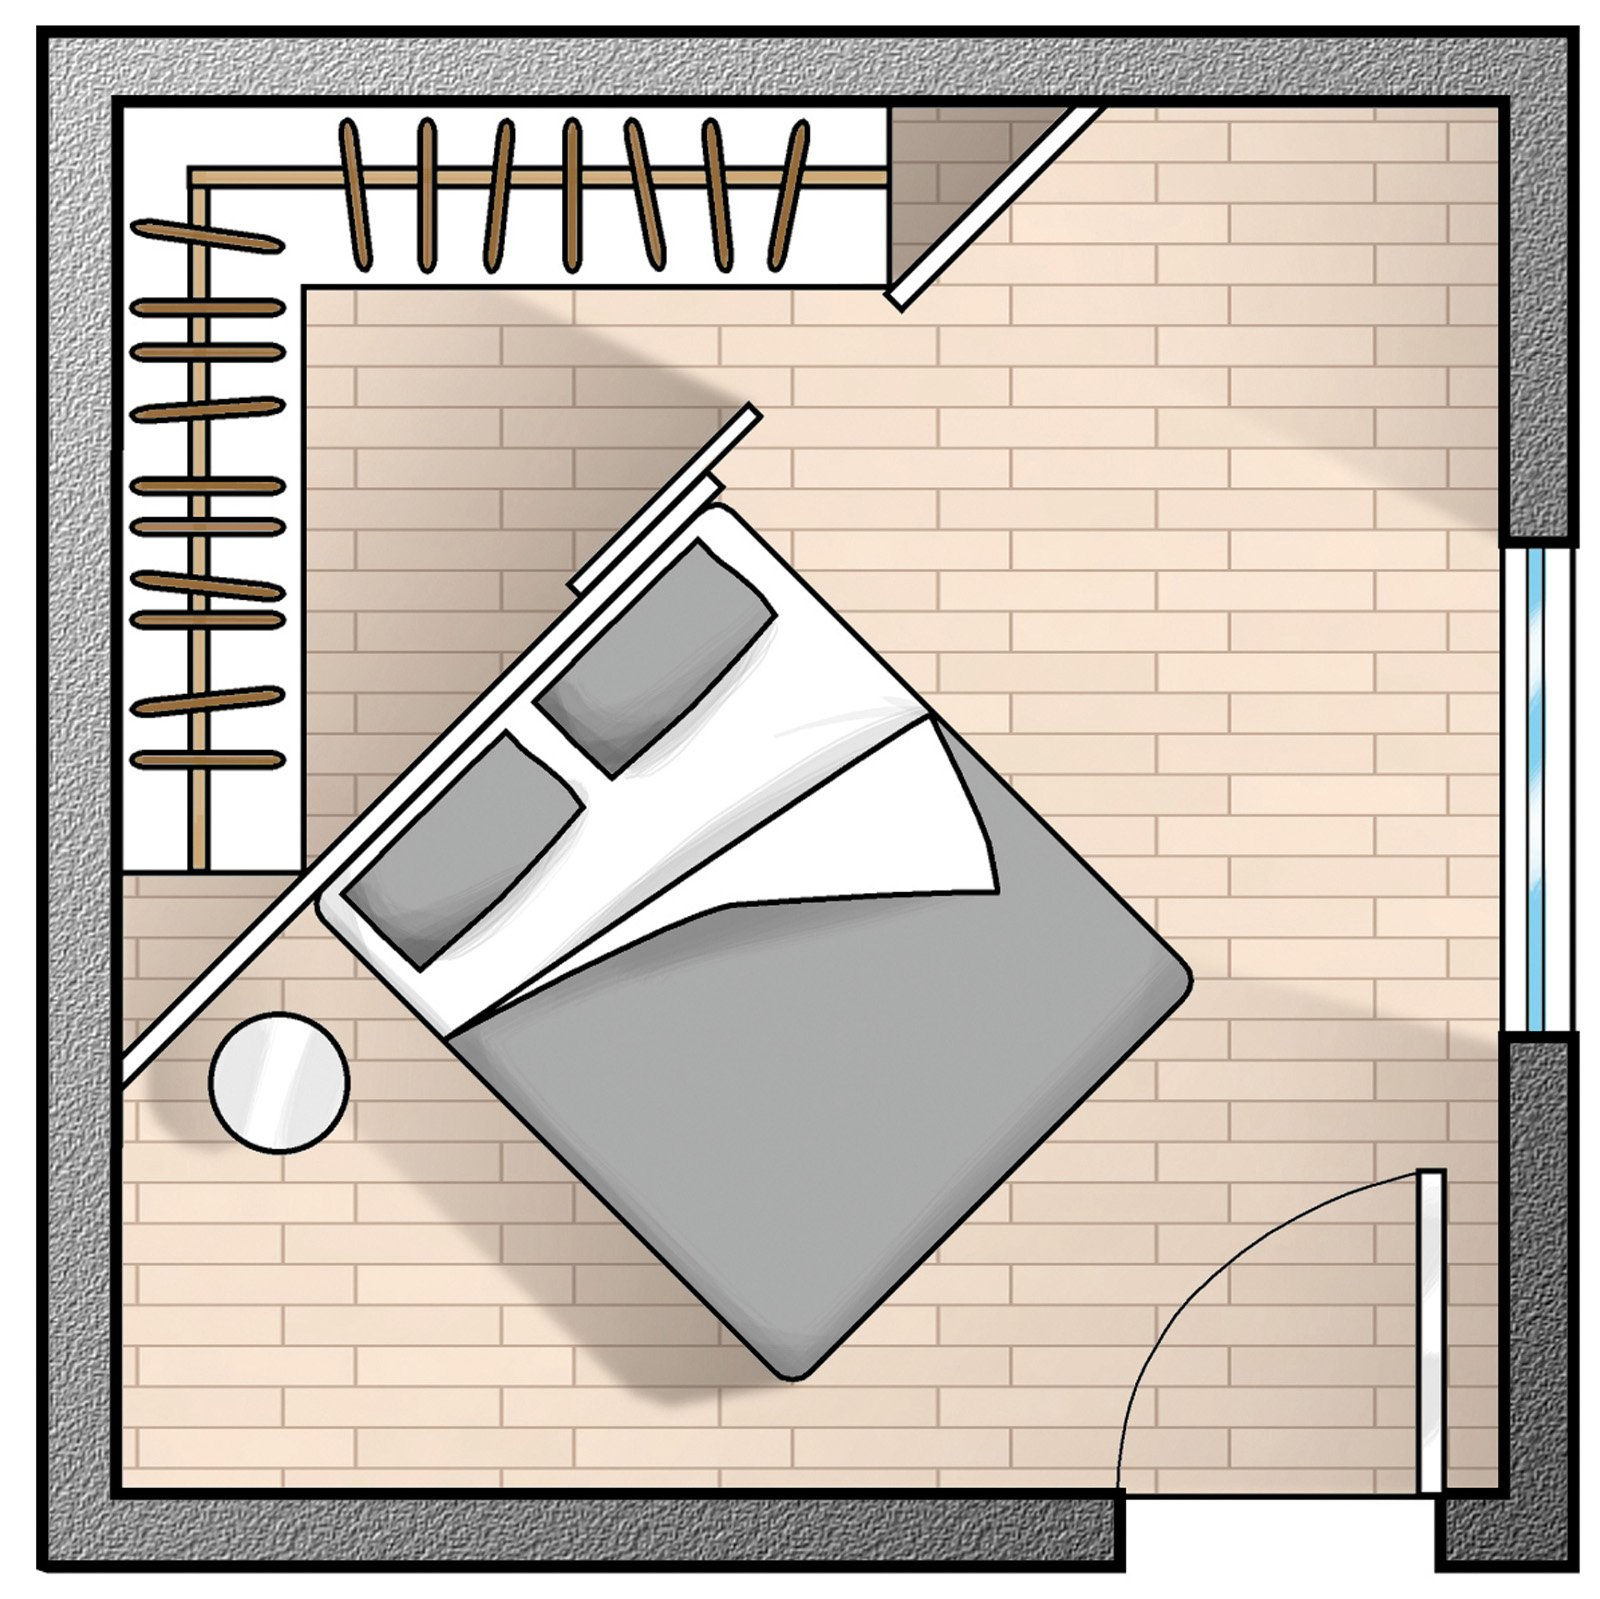 cabine armadio, soluzione trendy - cose di casa - Idee Cabina Armadio Mansarda